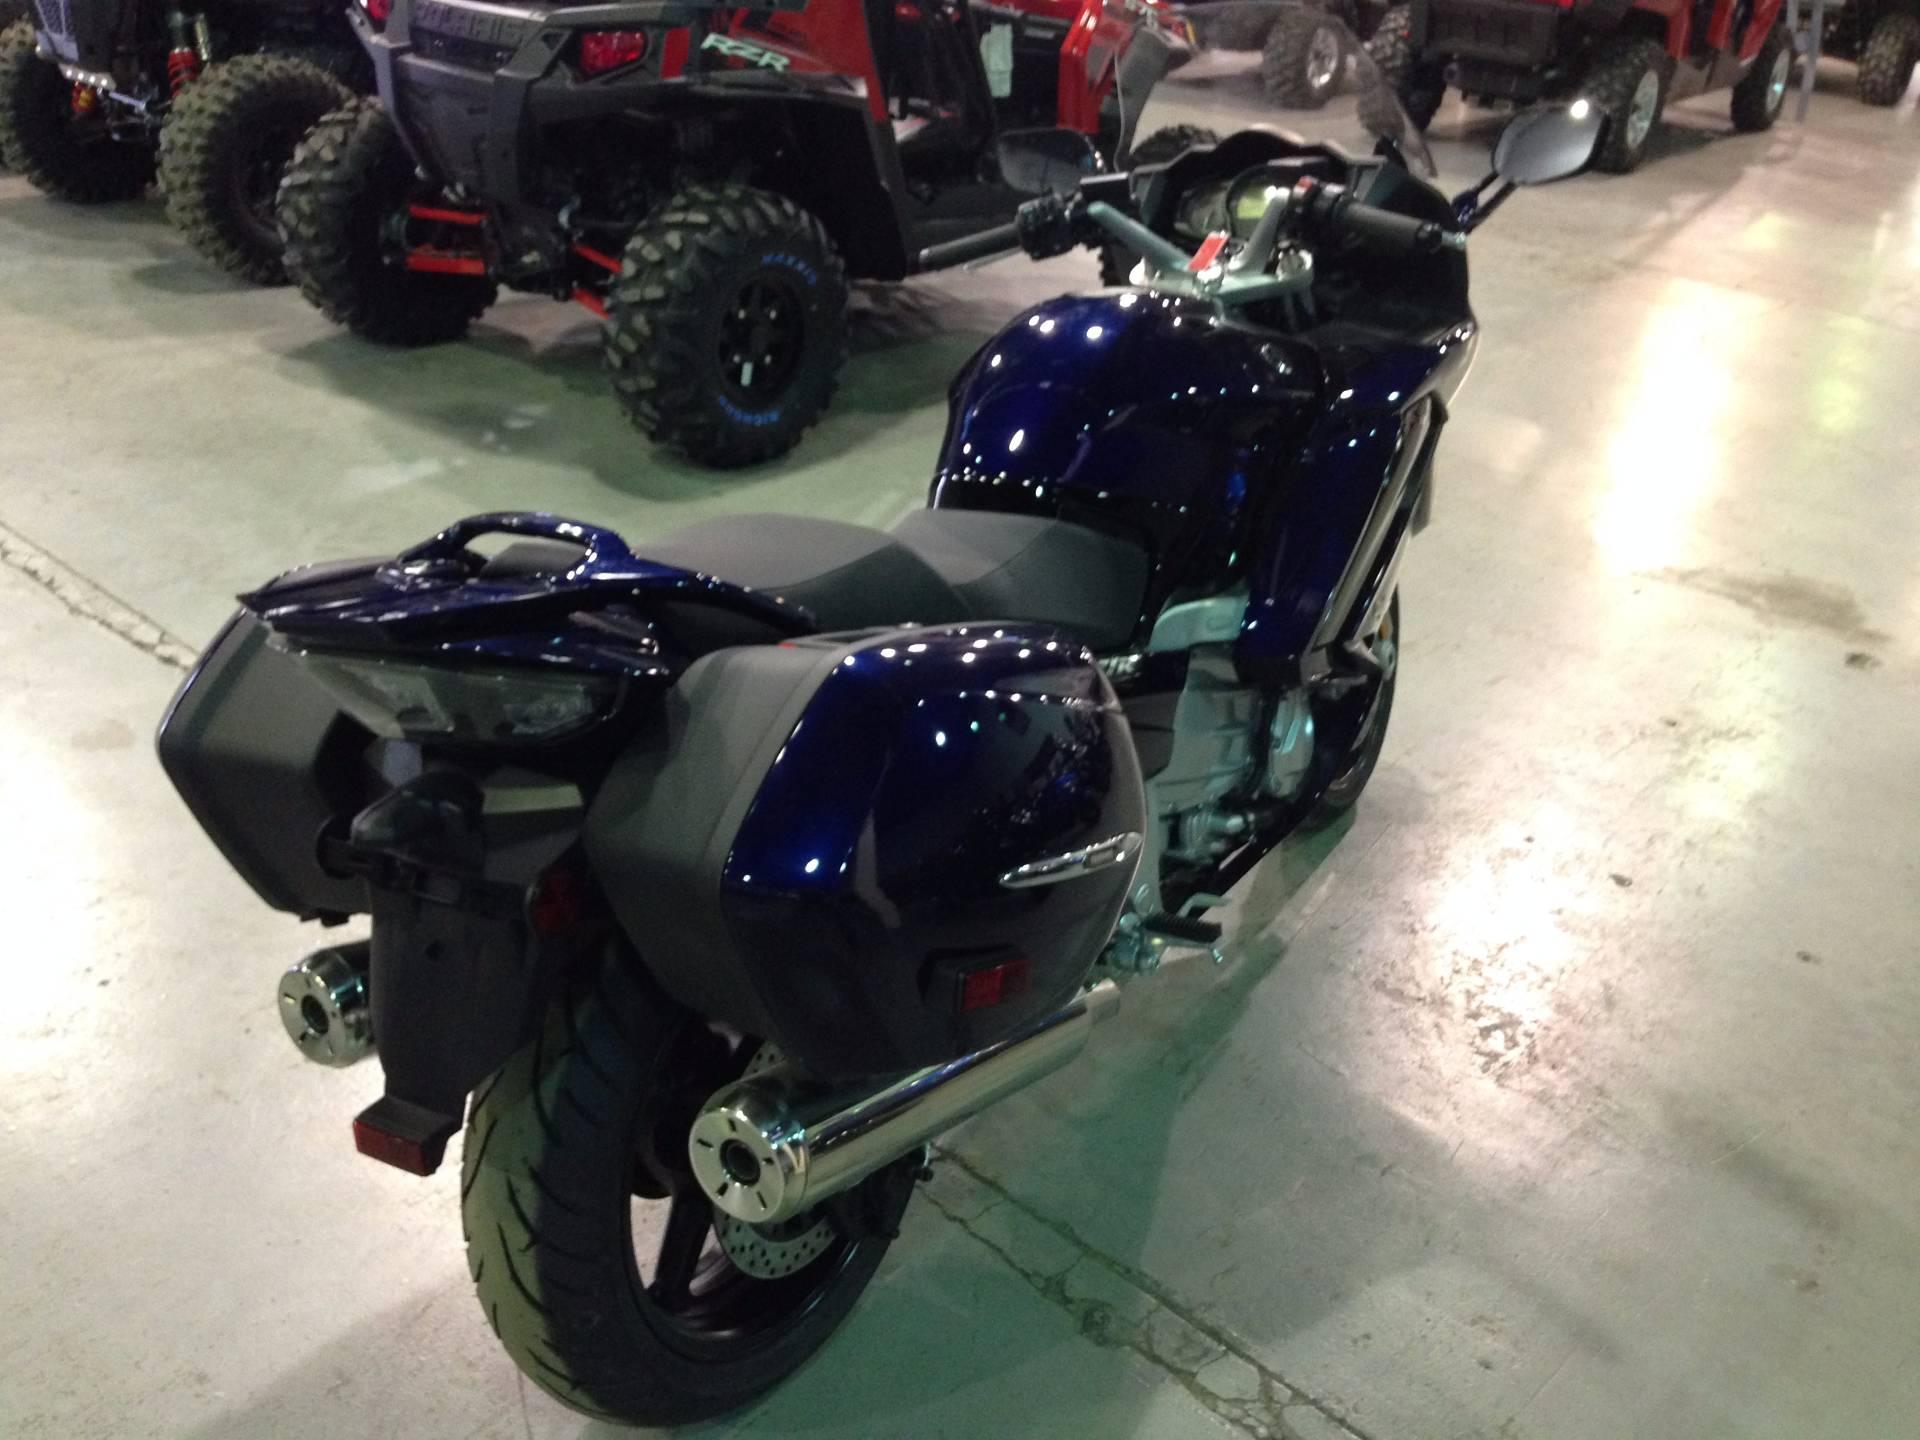 2016 Yamaha FJR1300A 6